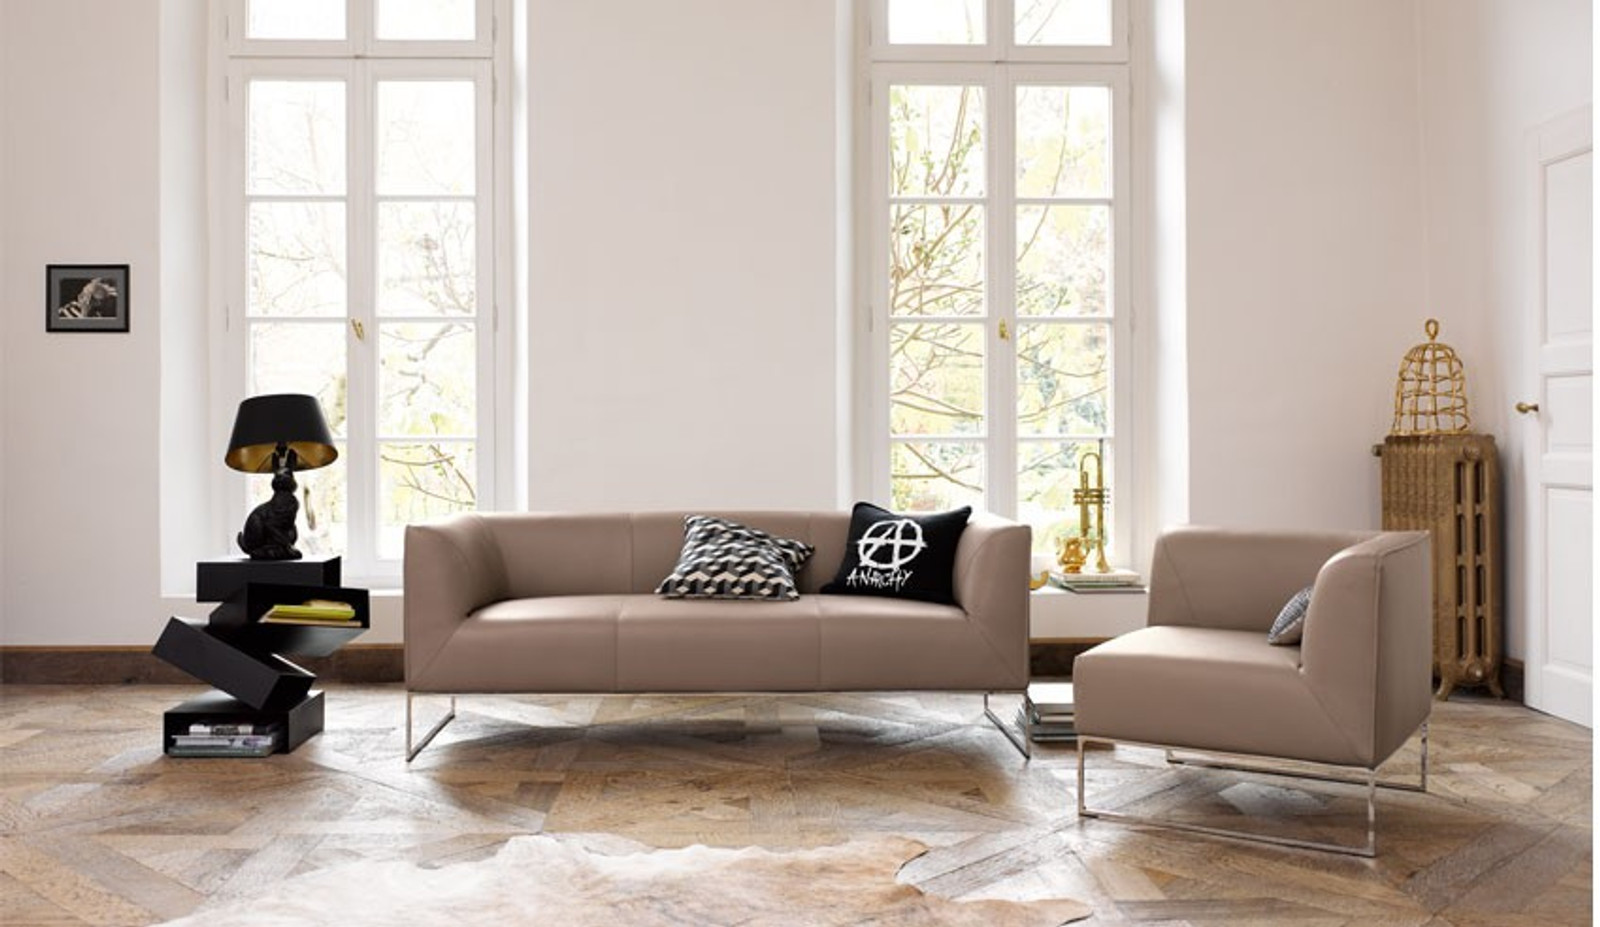 COR / Sofa / Modell MELL LOUNGE